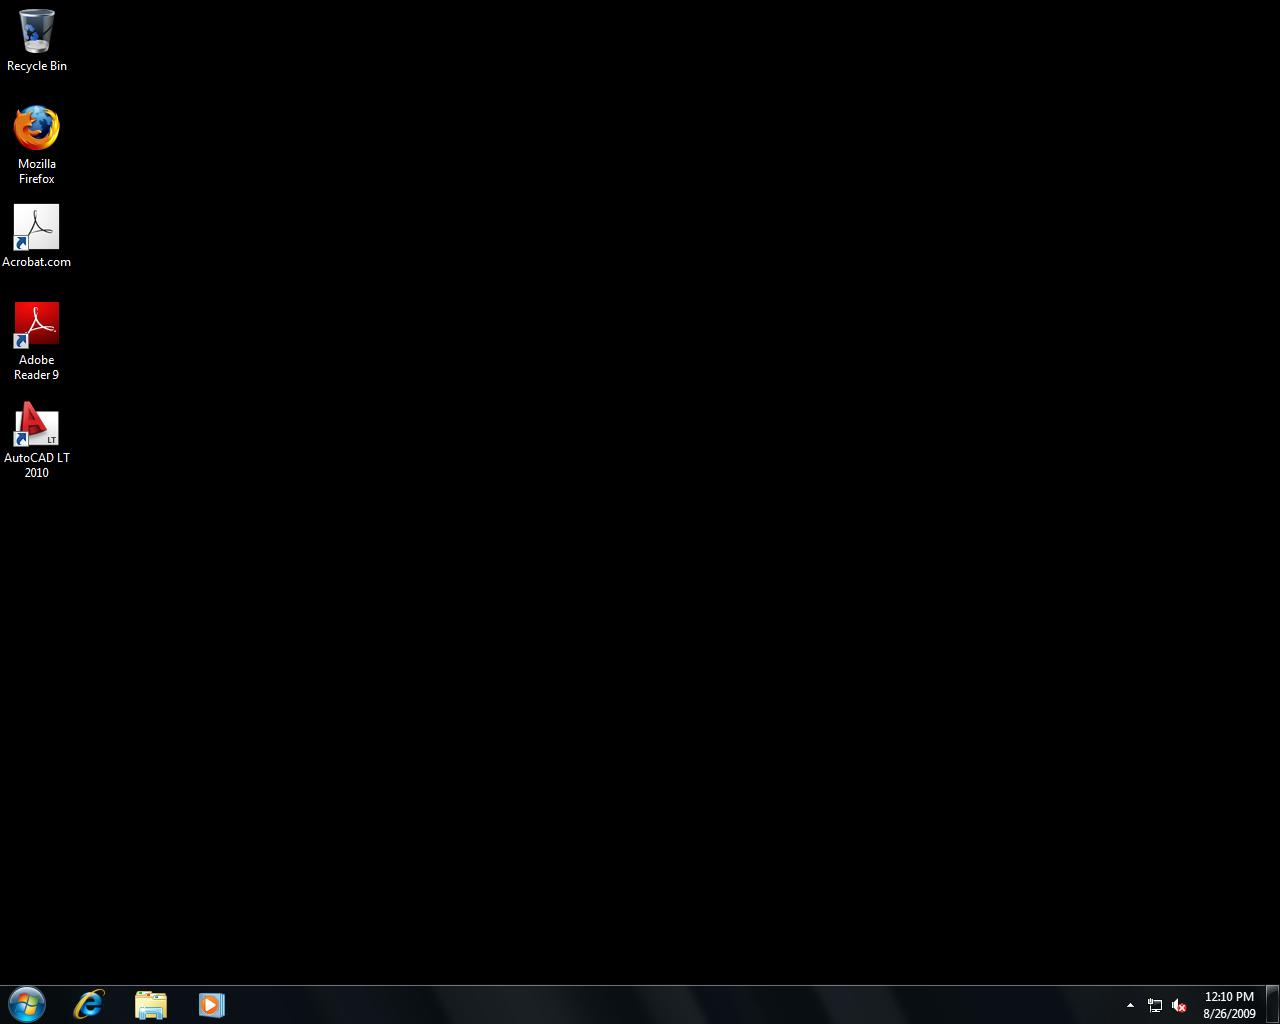 Desktop wallpaper registry windows 7